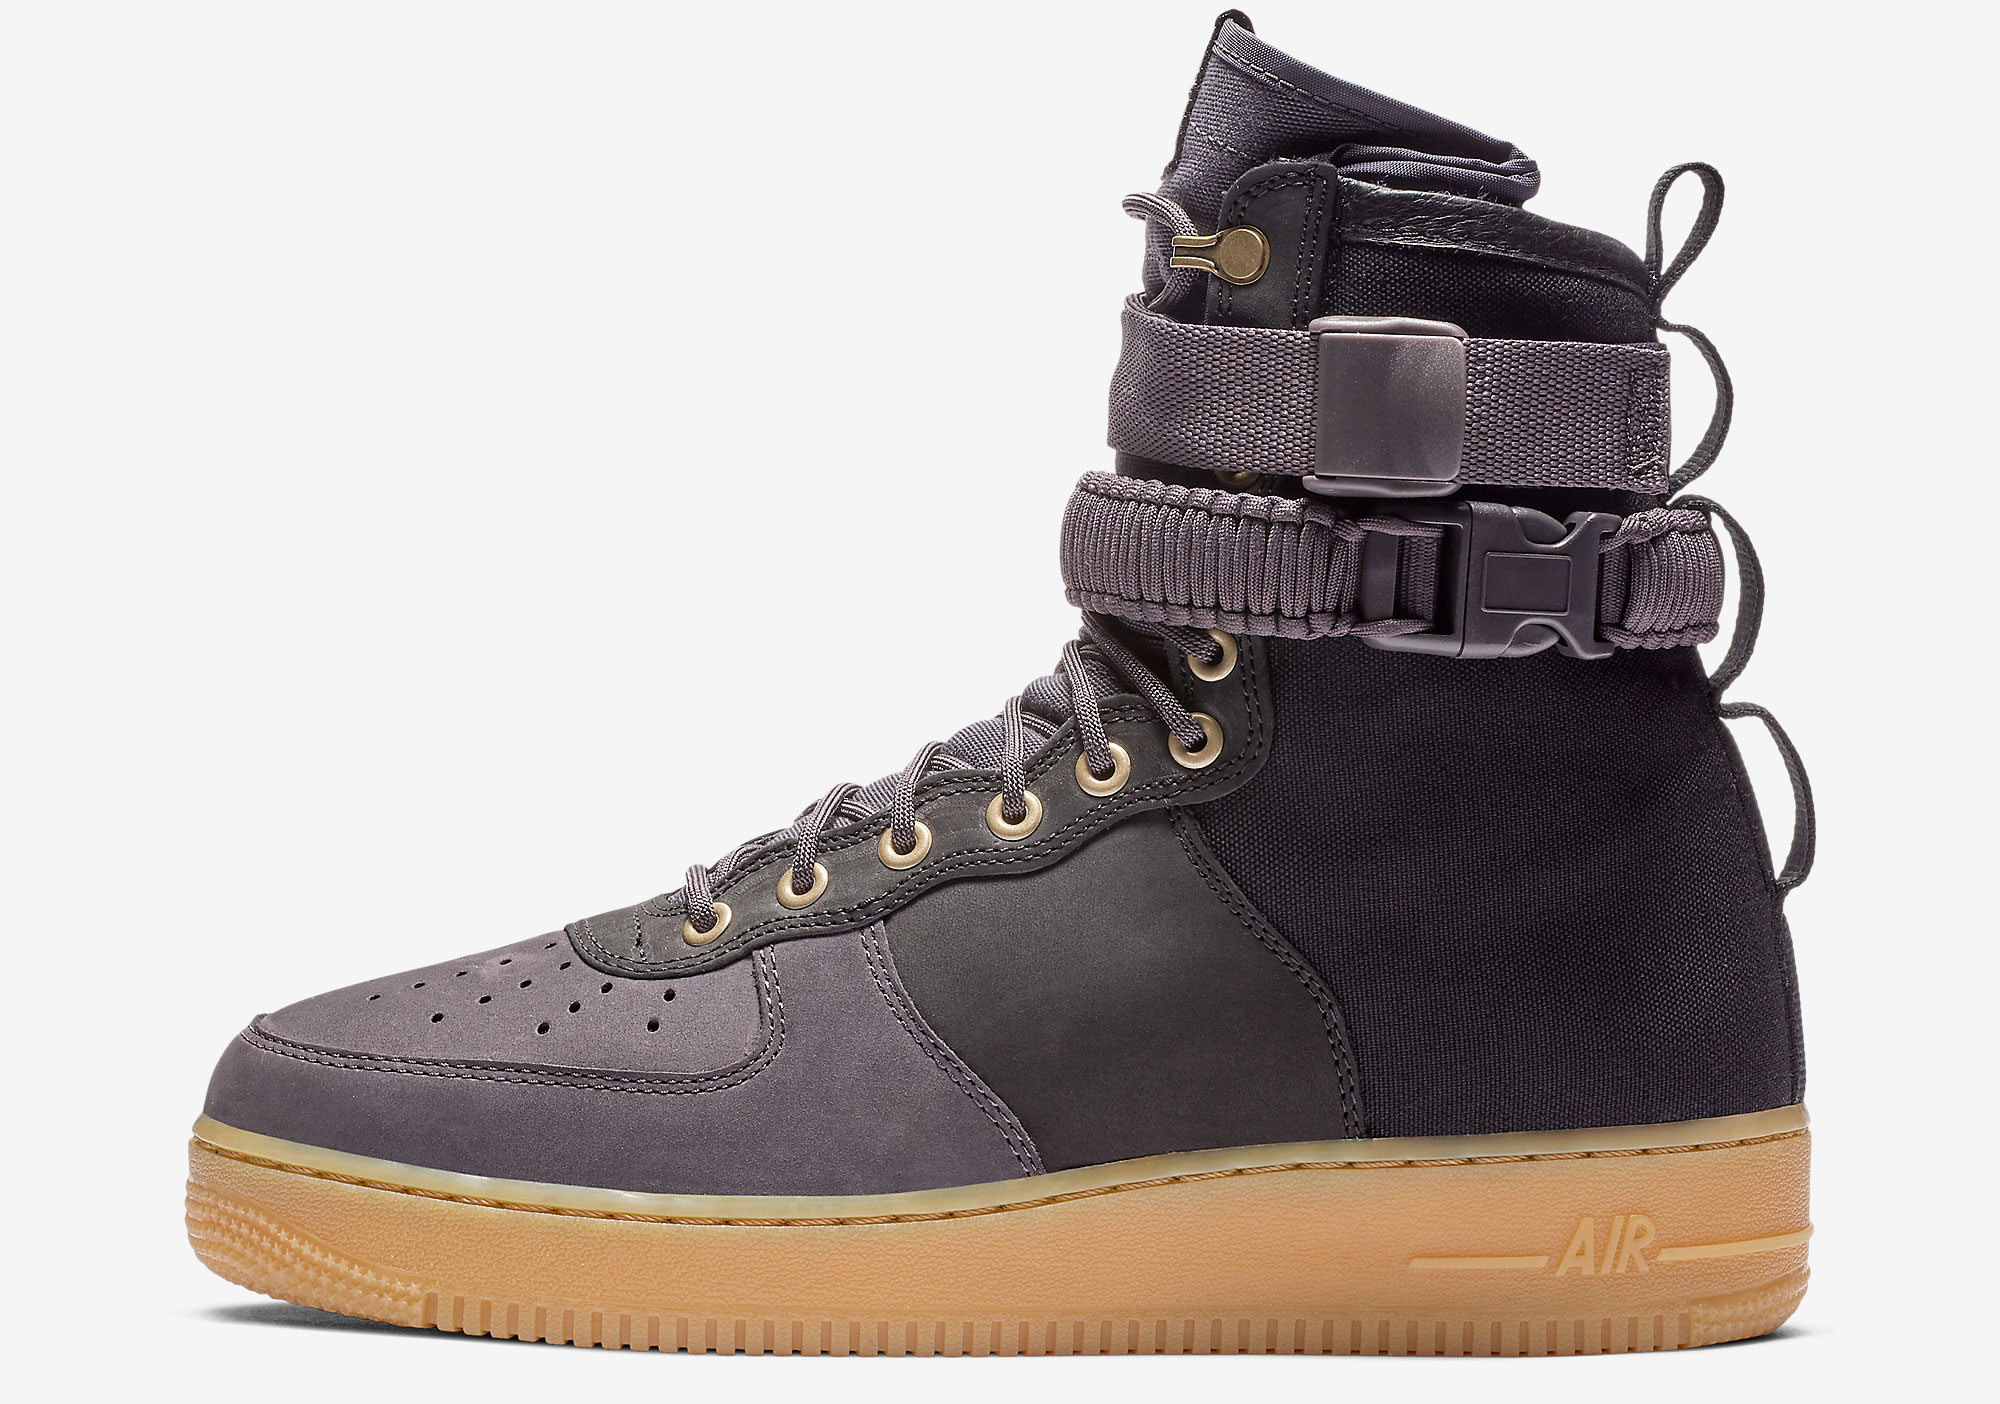 Nike SF Air Force 1 High BV0130 001 Release Info